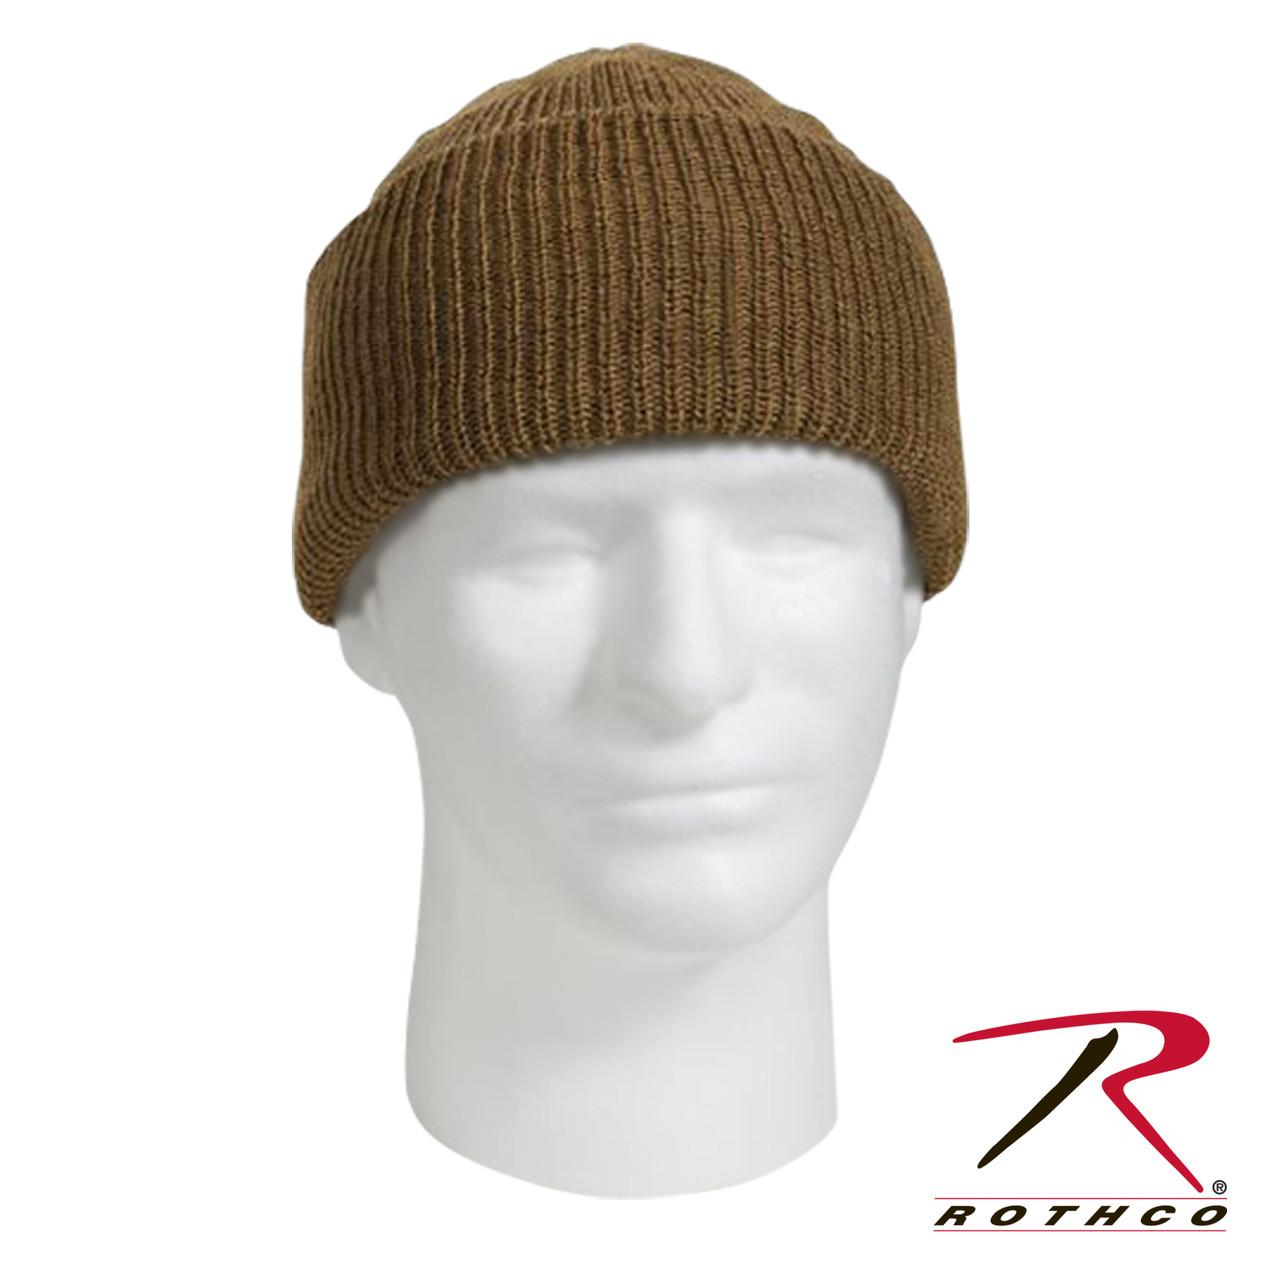 7634cb76 Genuine G.I. Wool Watch Cap - LMGS Online